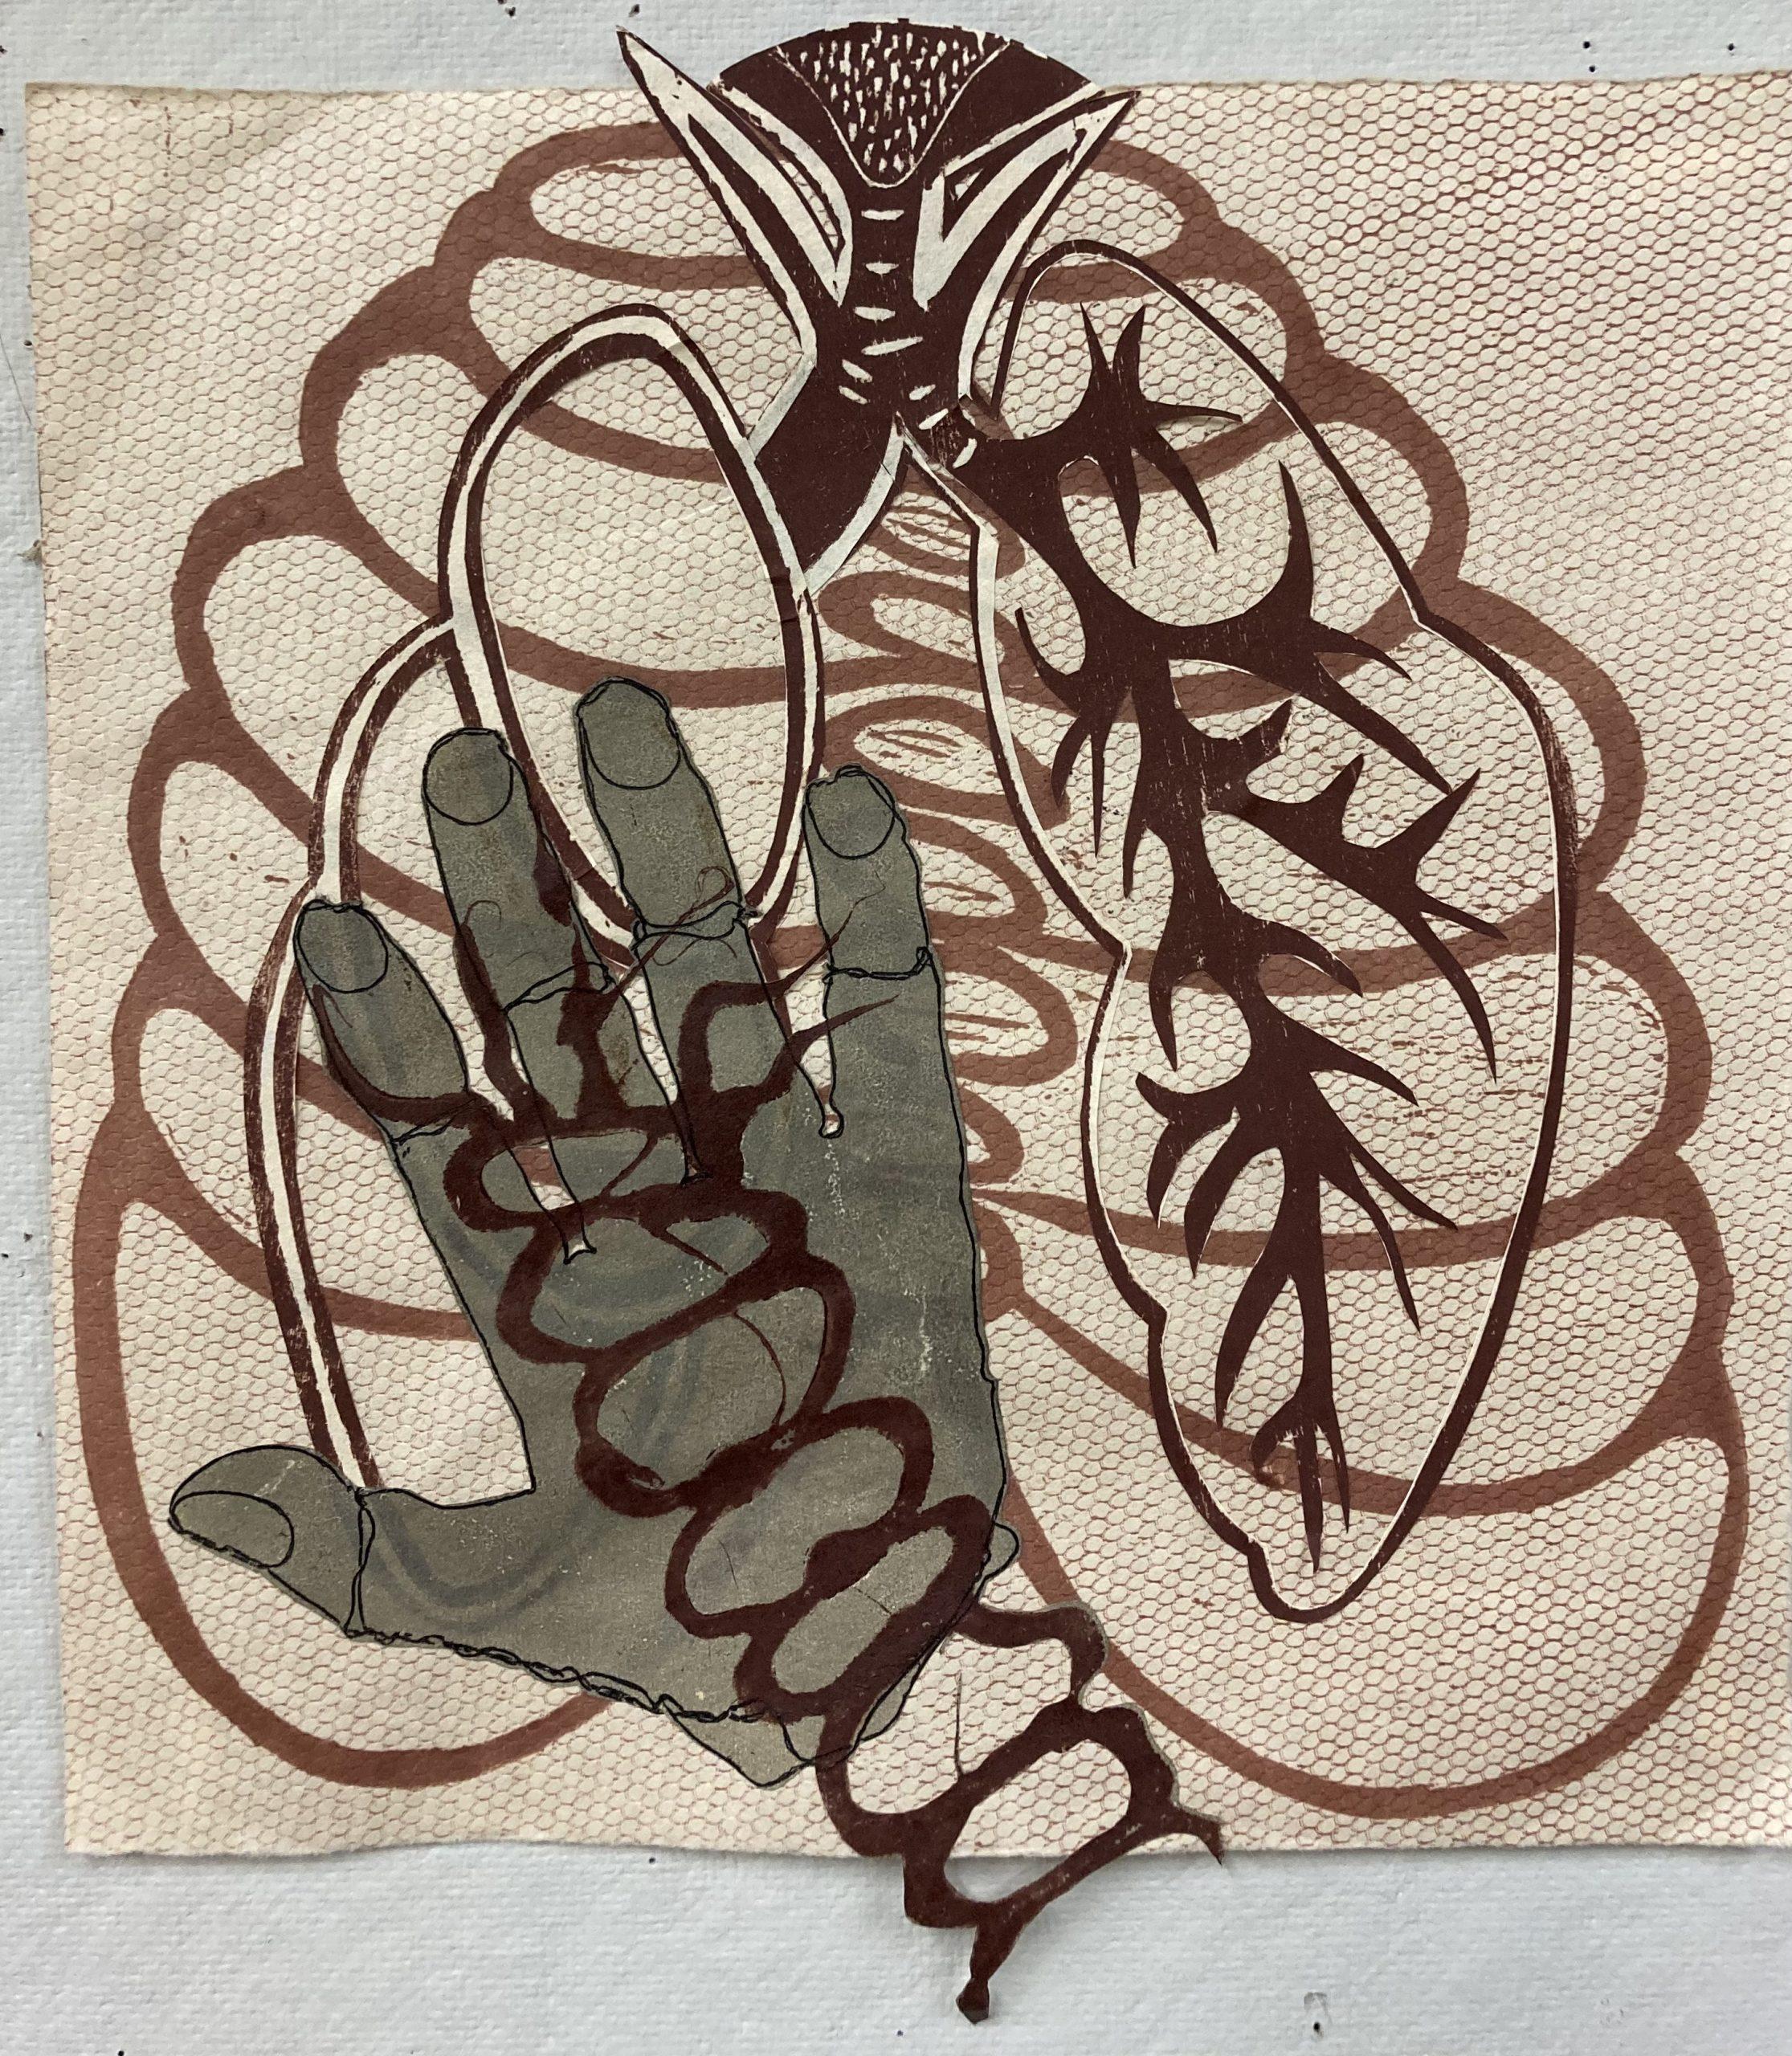 Debra Olin  -  Don't Touch  -   monoprint collage  -  woodcut  -  6 x 16  -  $400